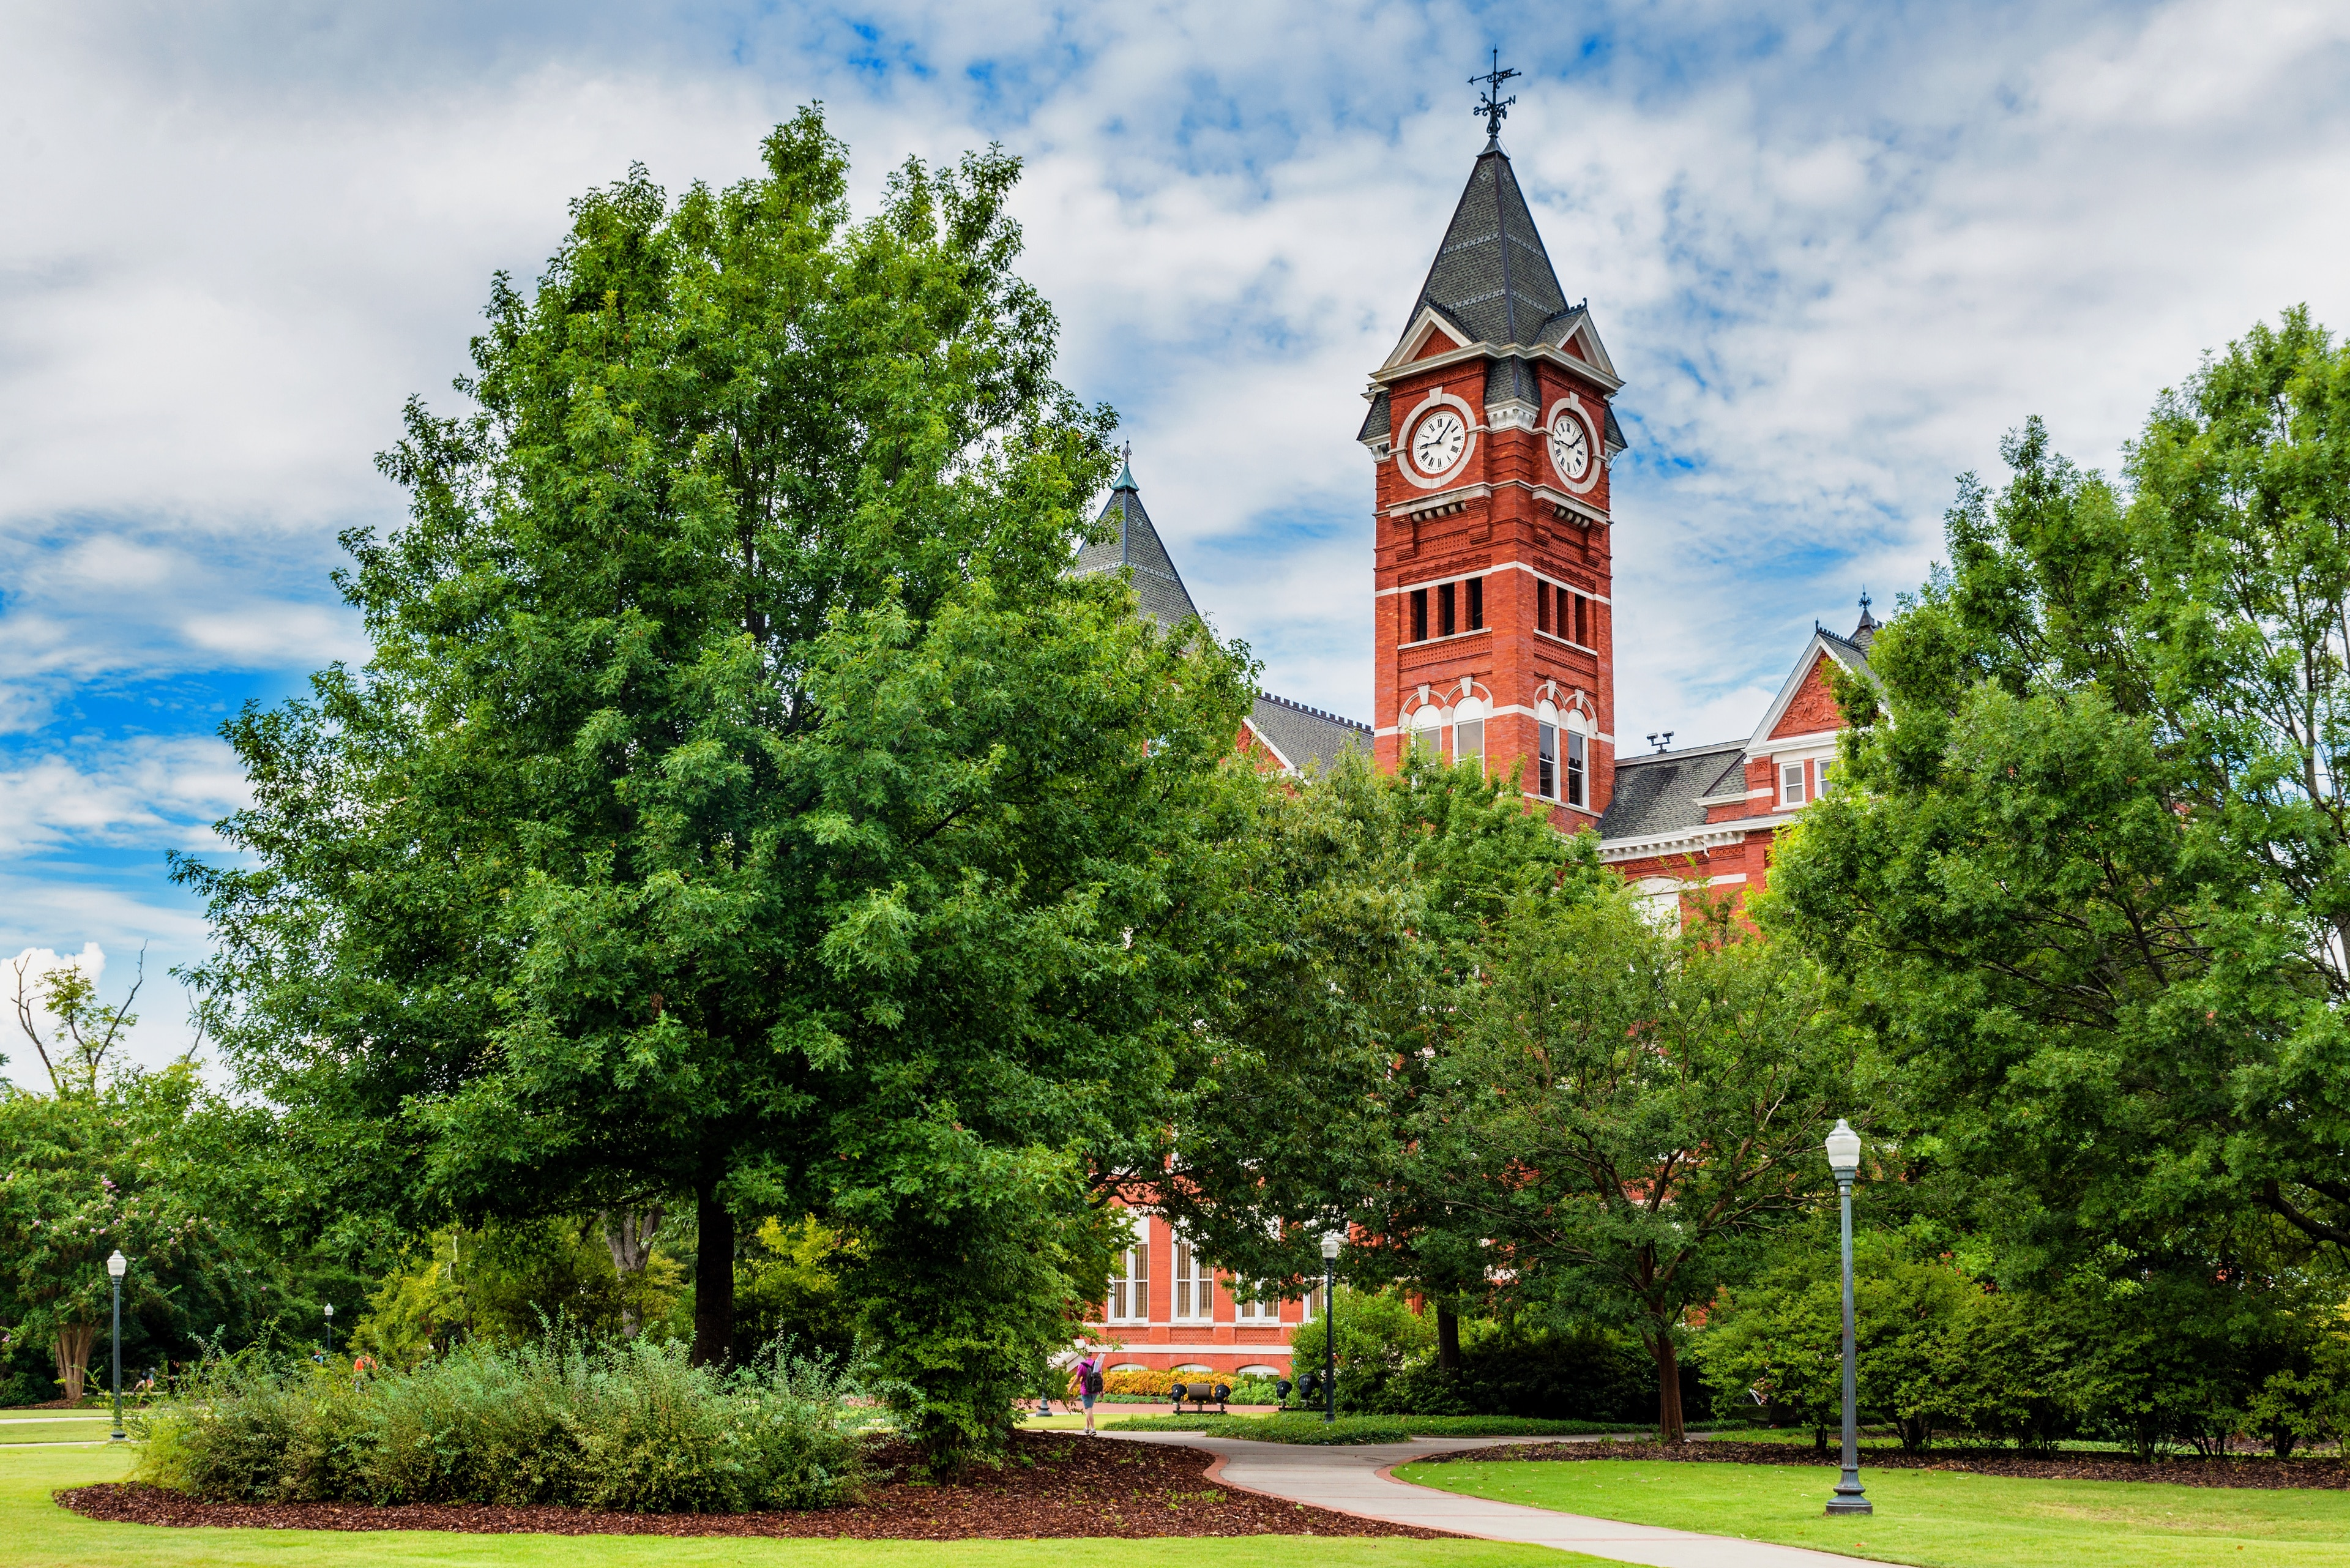 Lee County, Alabama, United States of America